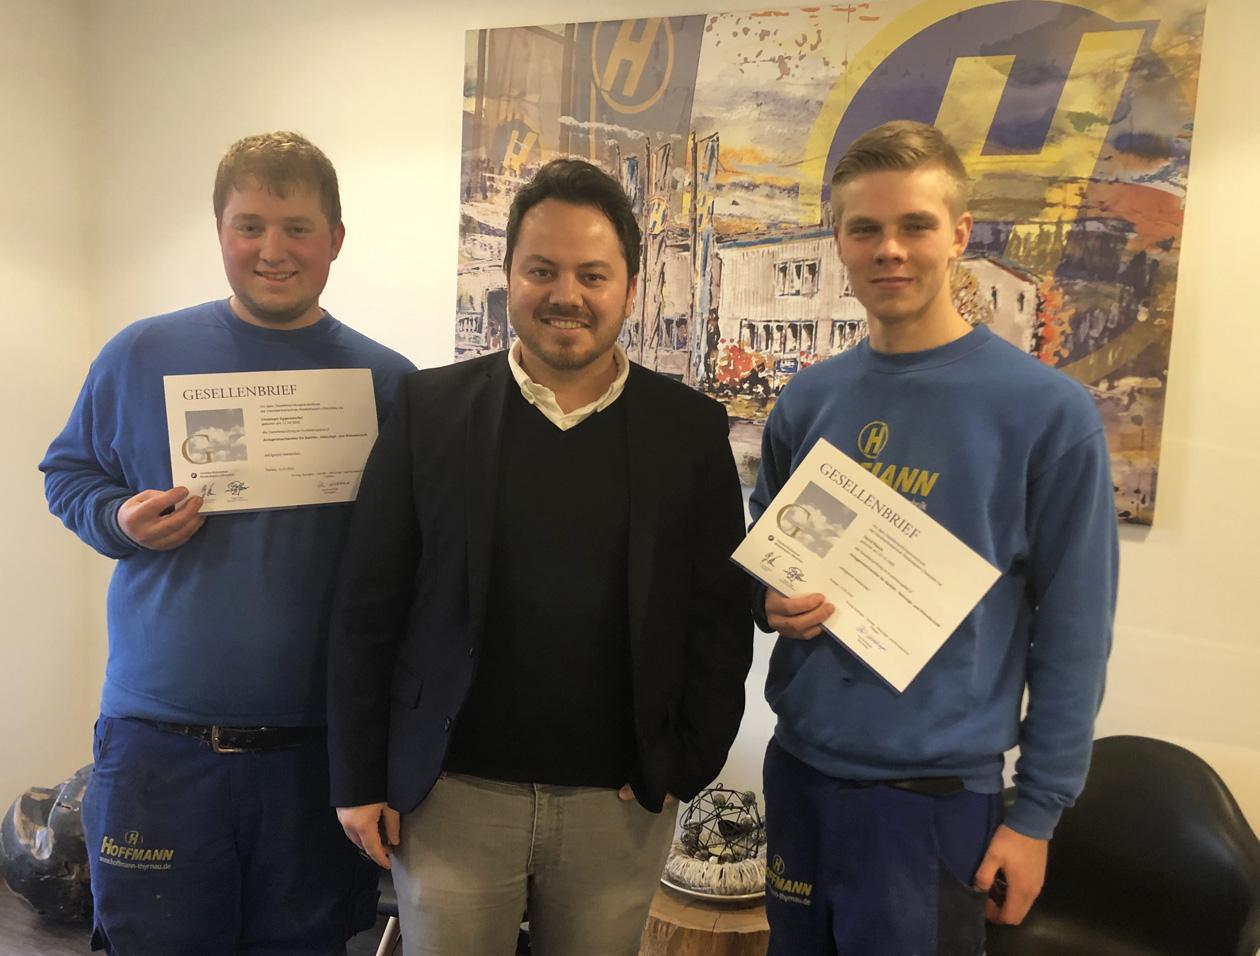 Ausbildung bei der Hoffmann Firmengruppe: Ausbildung zum Anlagenmechaniker